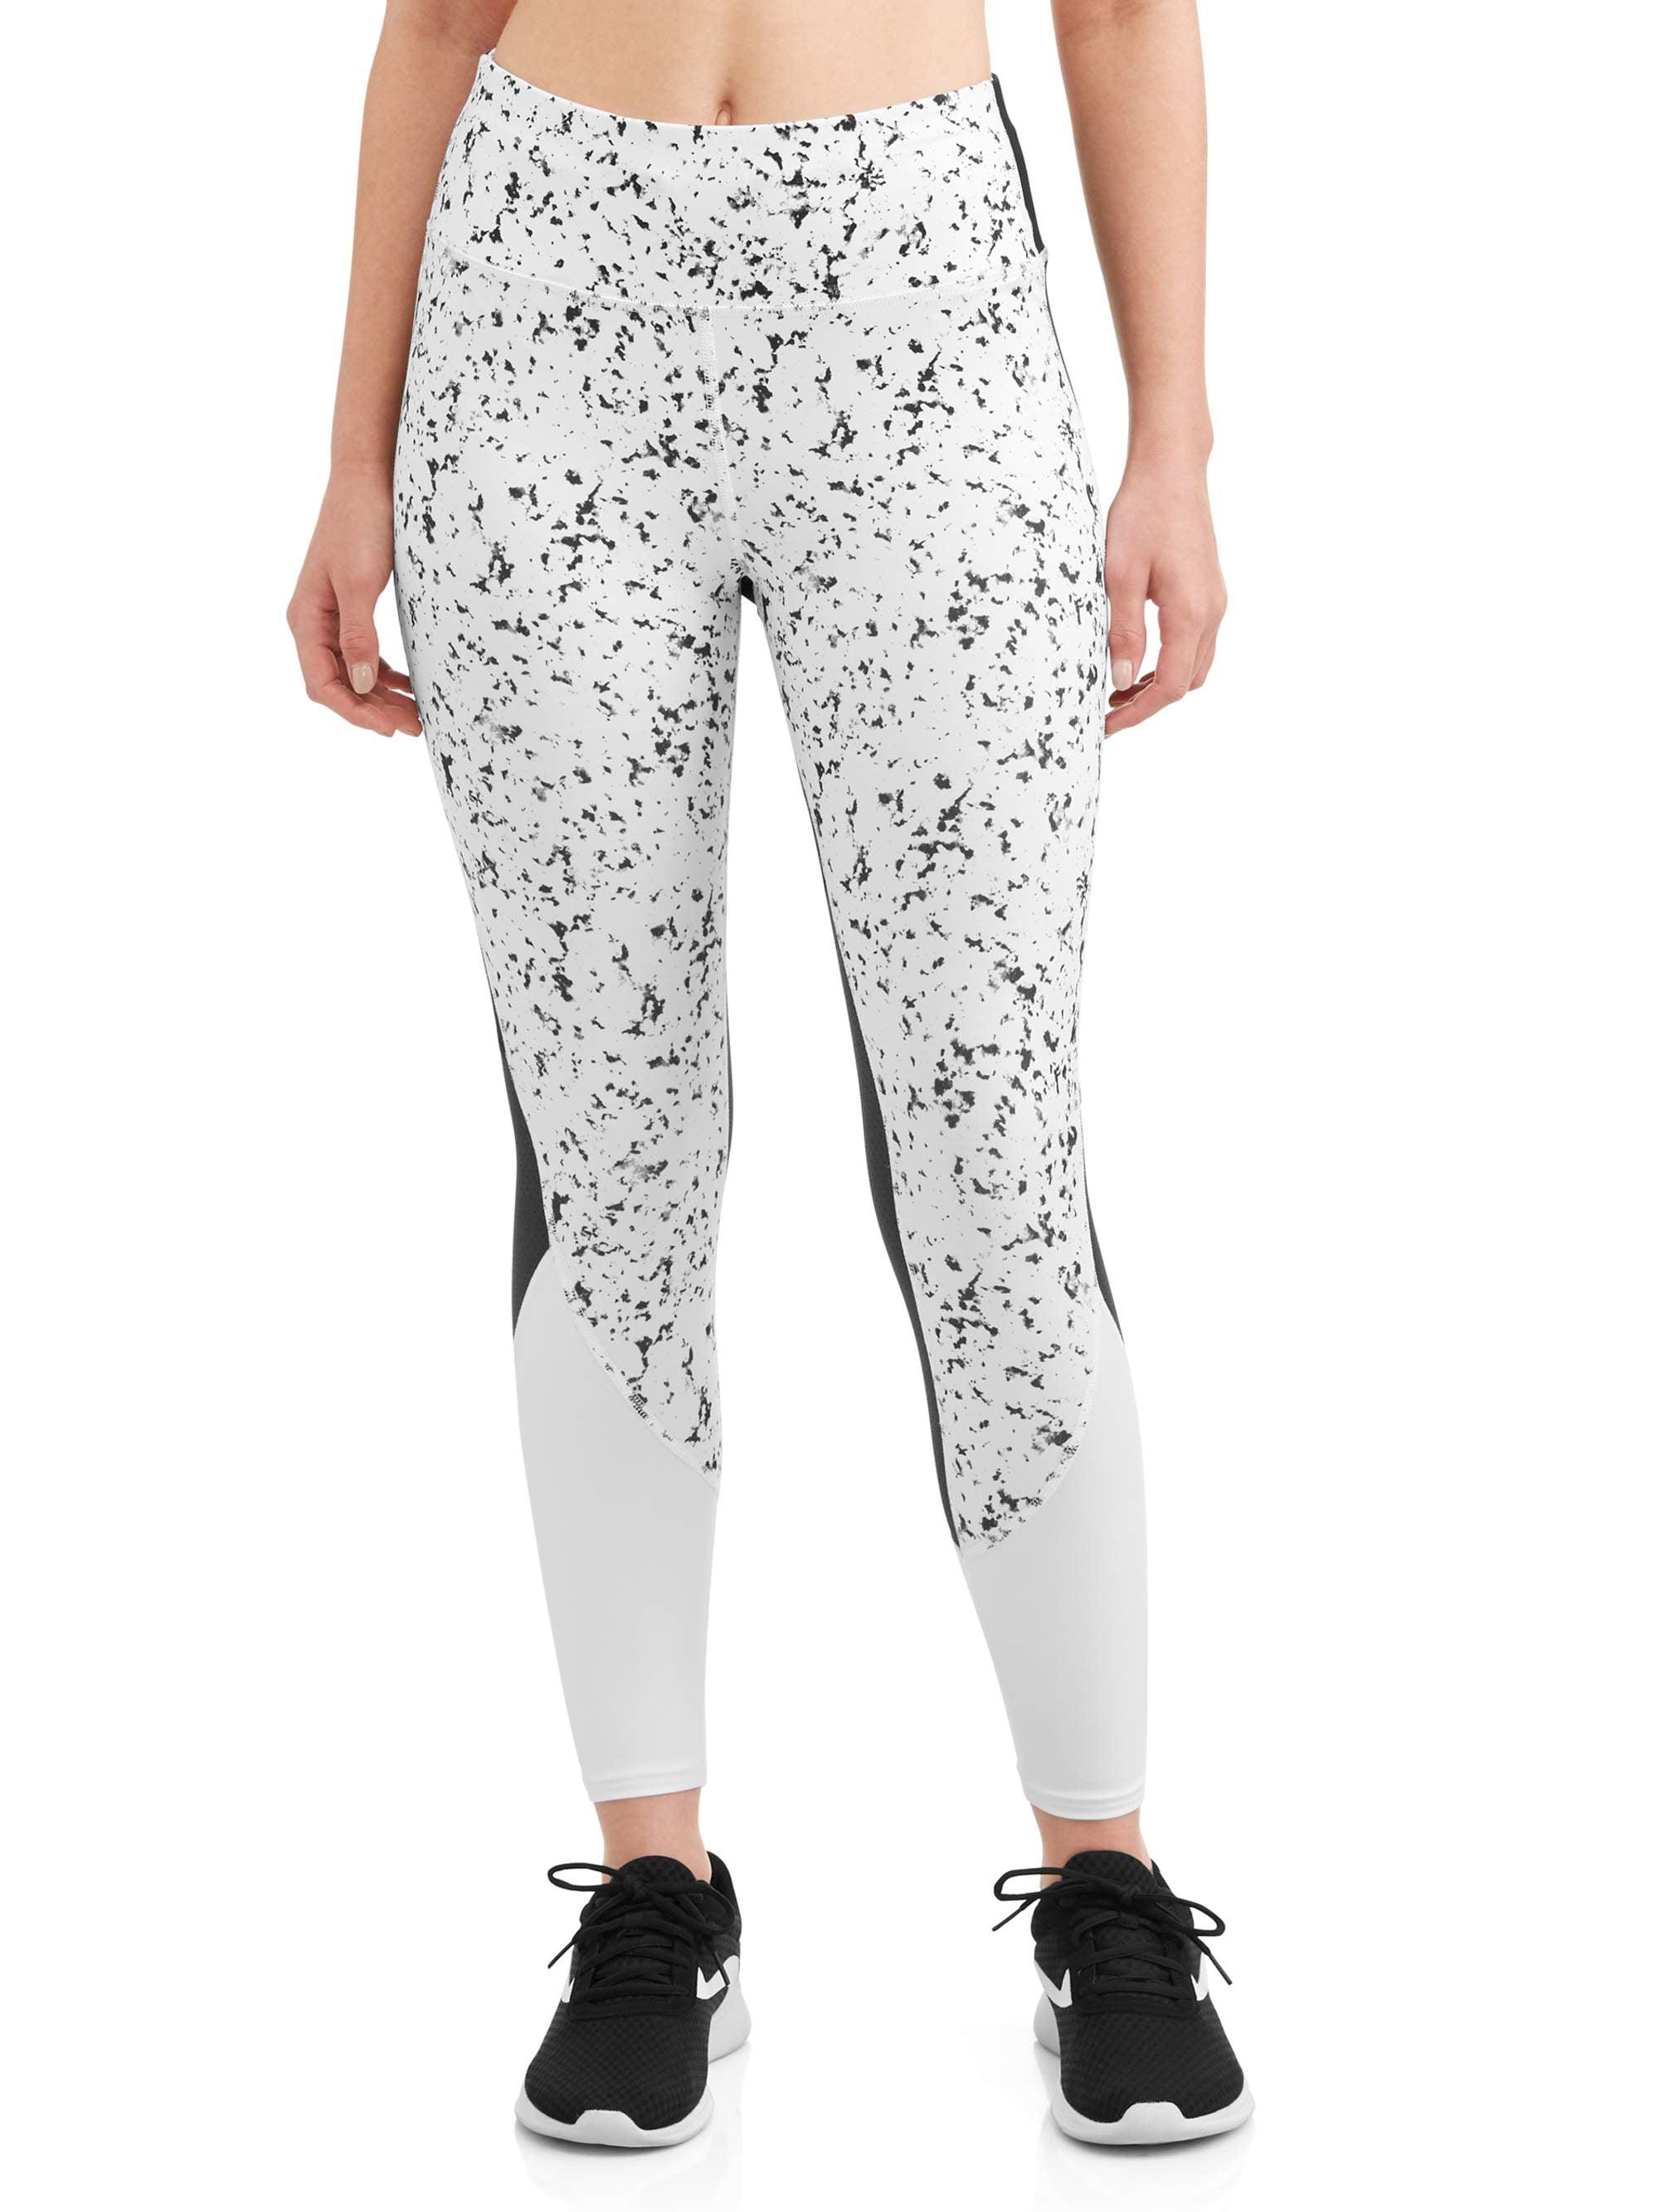 Women's Active Fashion Crop Legging